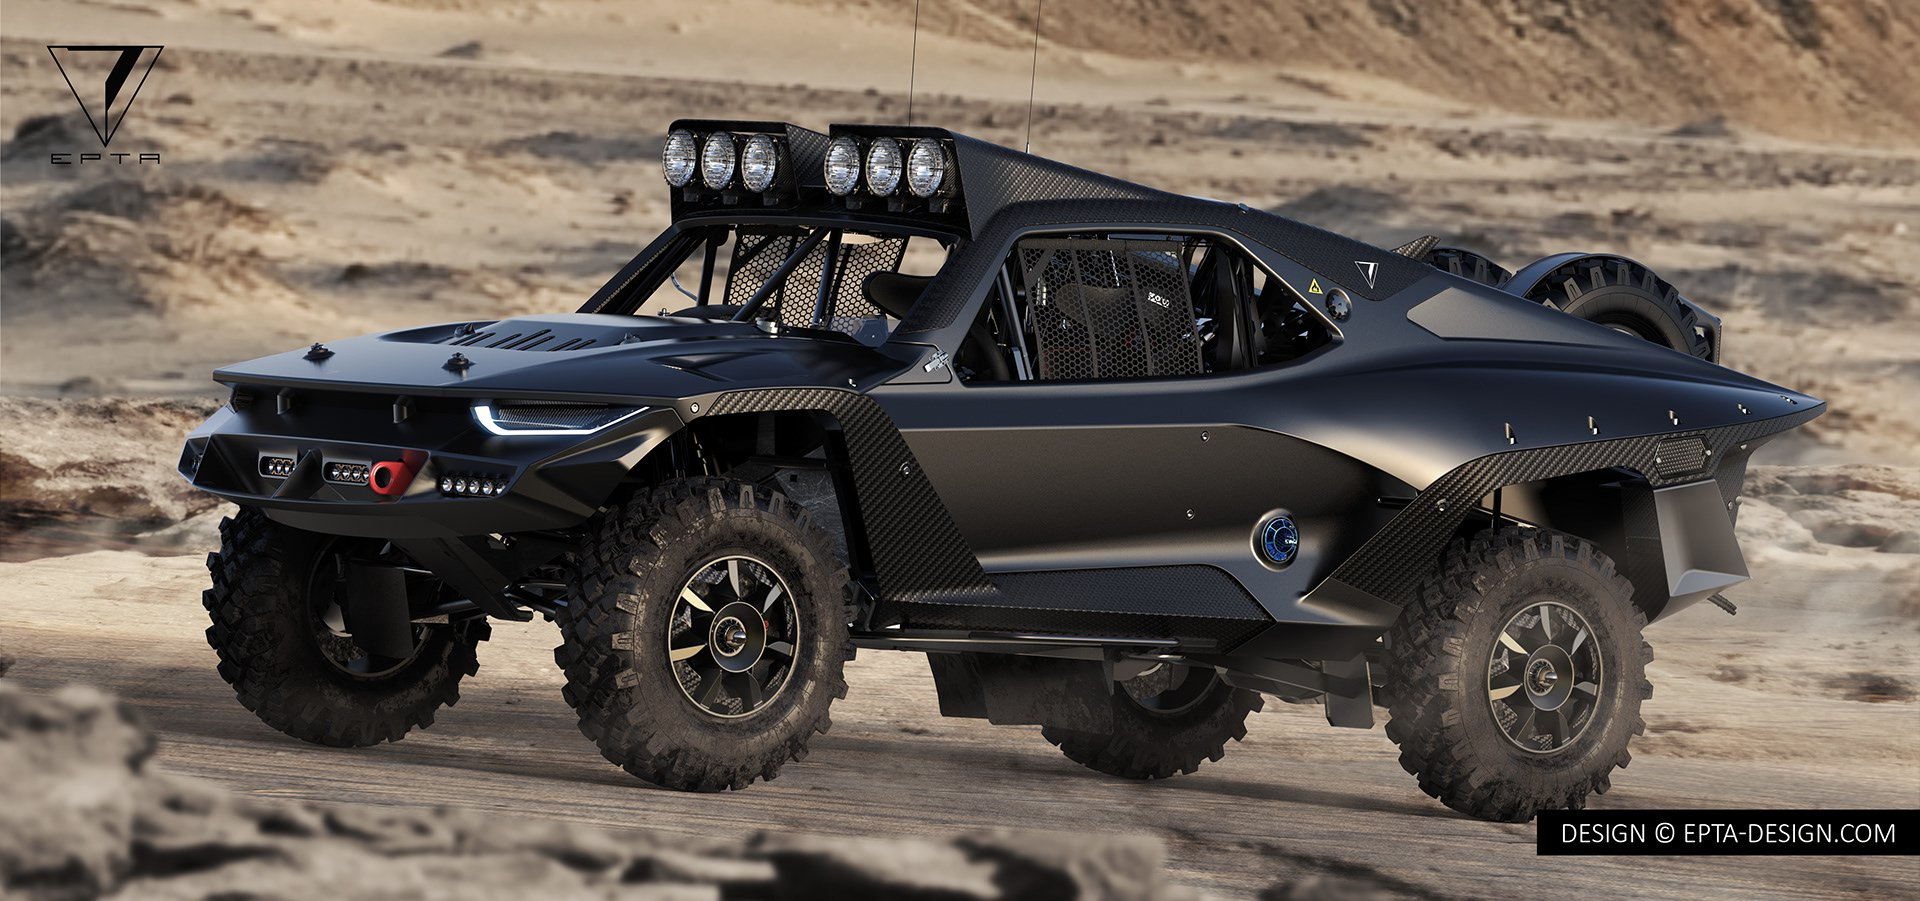 Desert Storm Trophy Truck by EPTA Design (3)